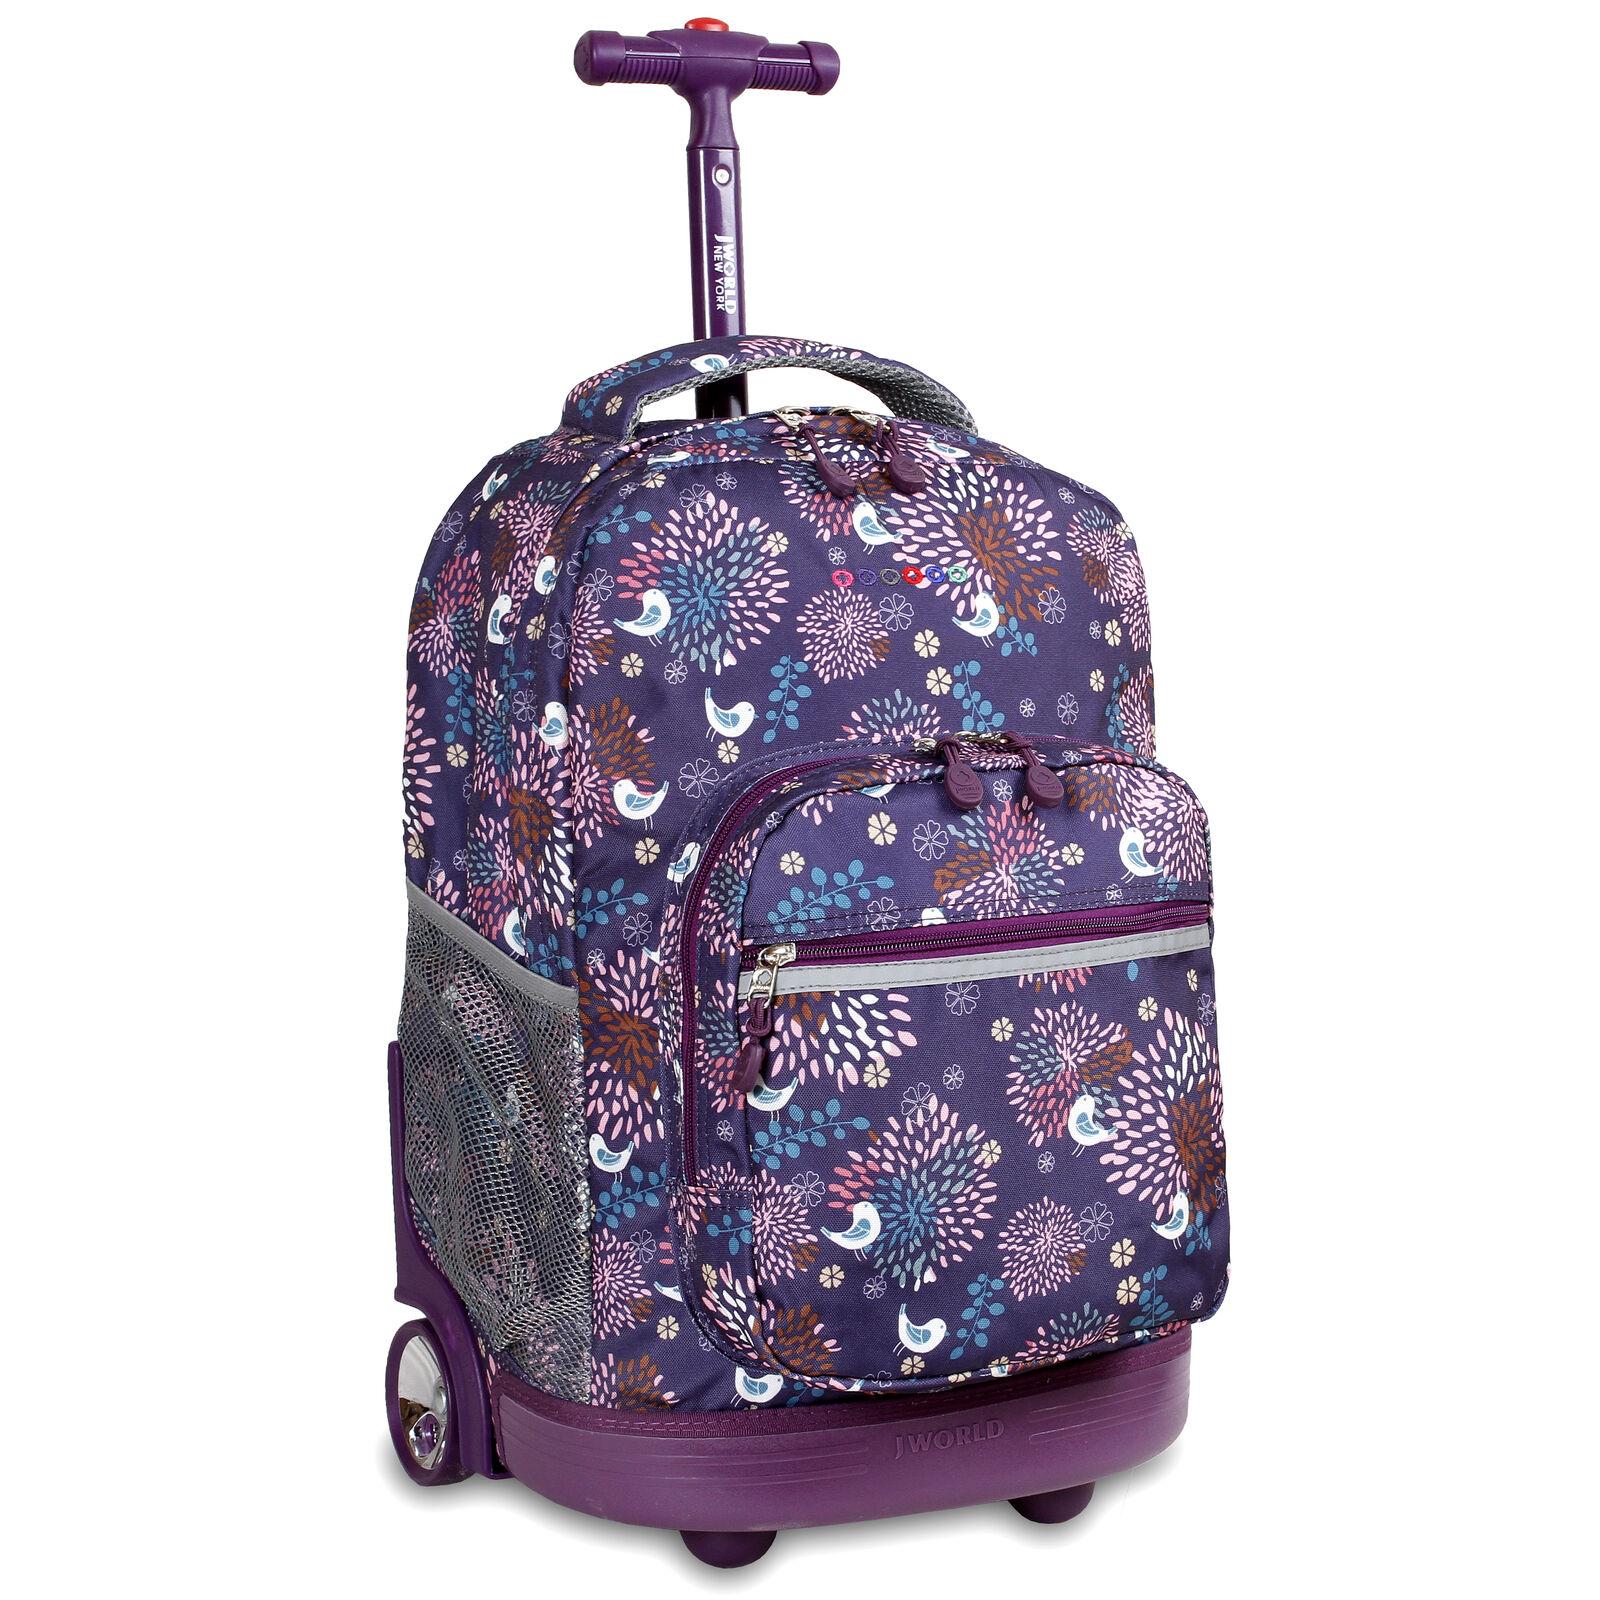 unisex luggage rolling backpack 18 travel bag